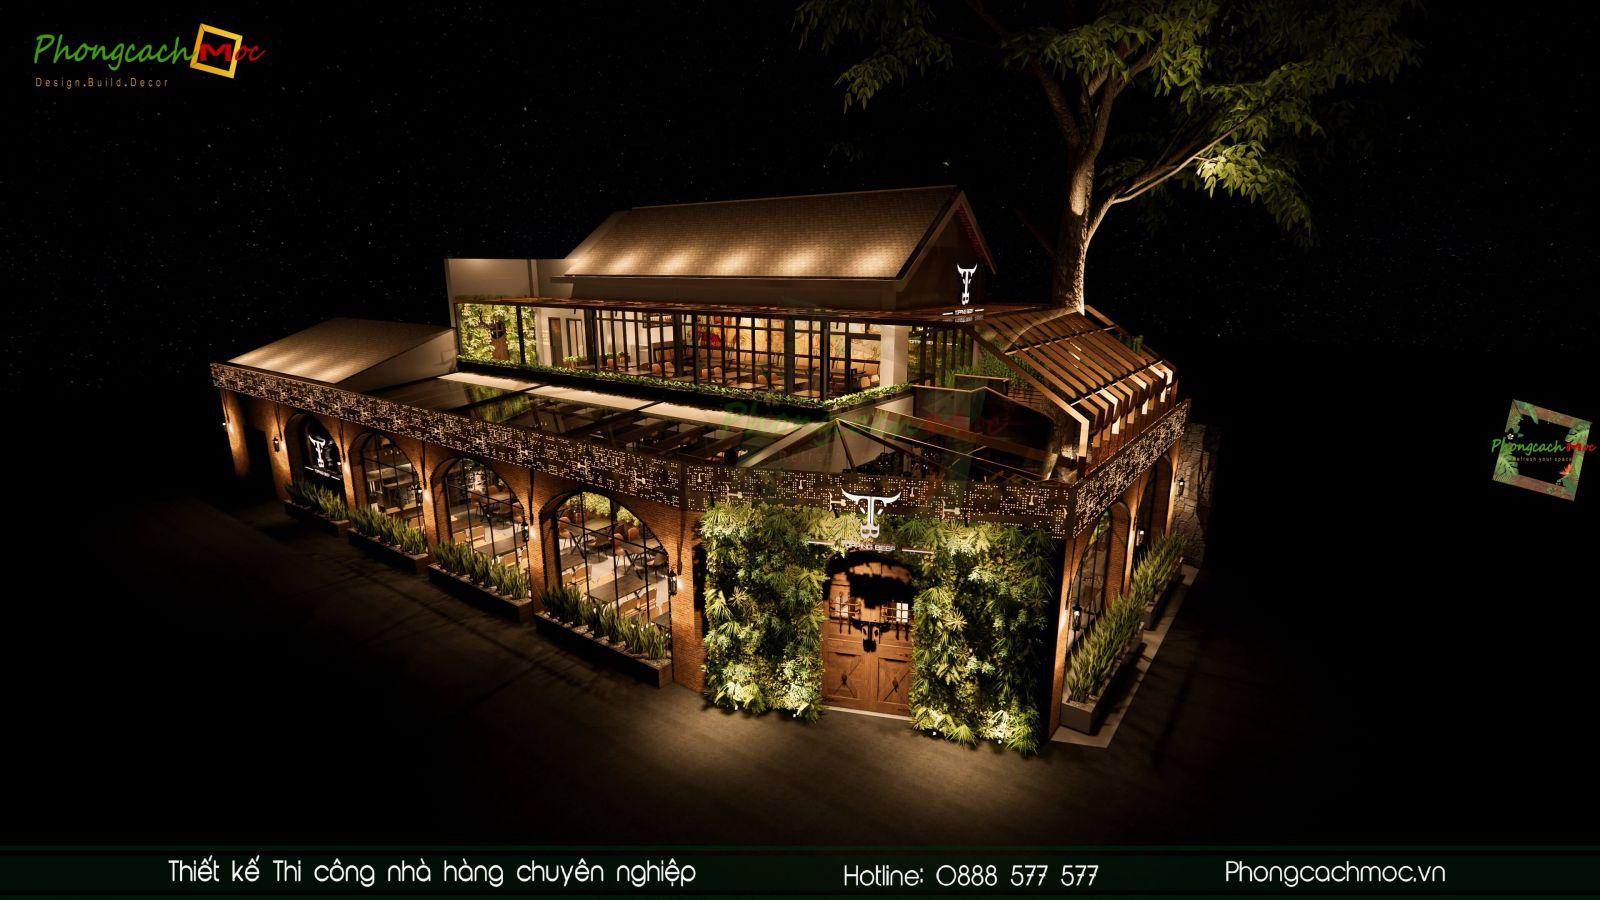 Thiet-ke-Nha-hang-The-Topping-Beef-Quan-154